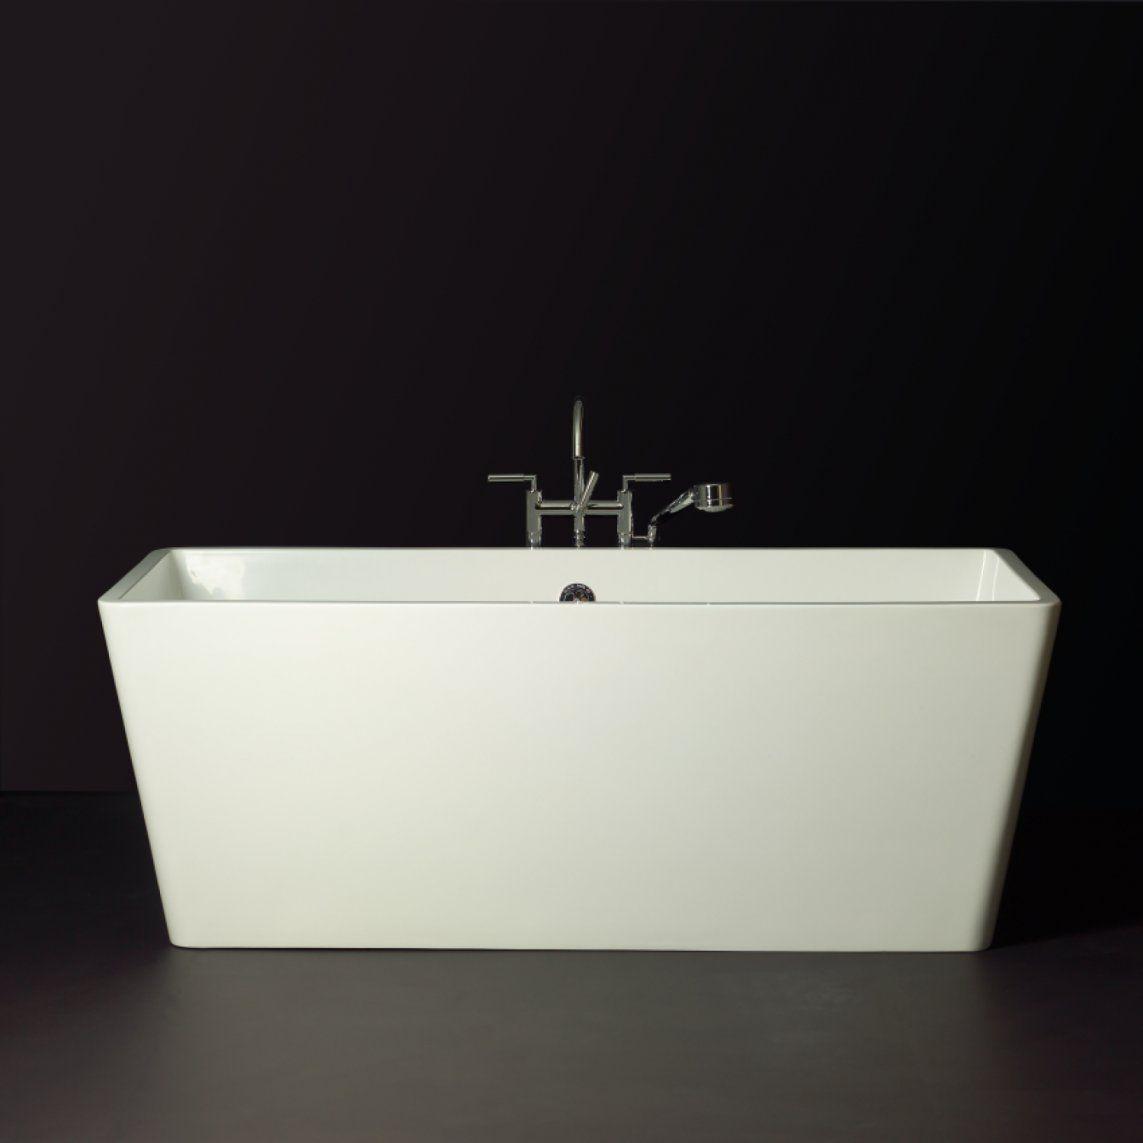 albion bath company fresnay vrijstaand bad modern vrijstaand bad - Bad Modern